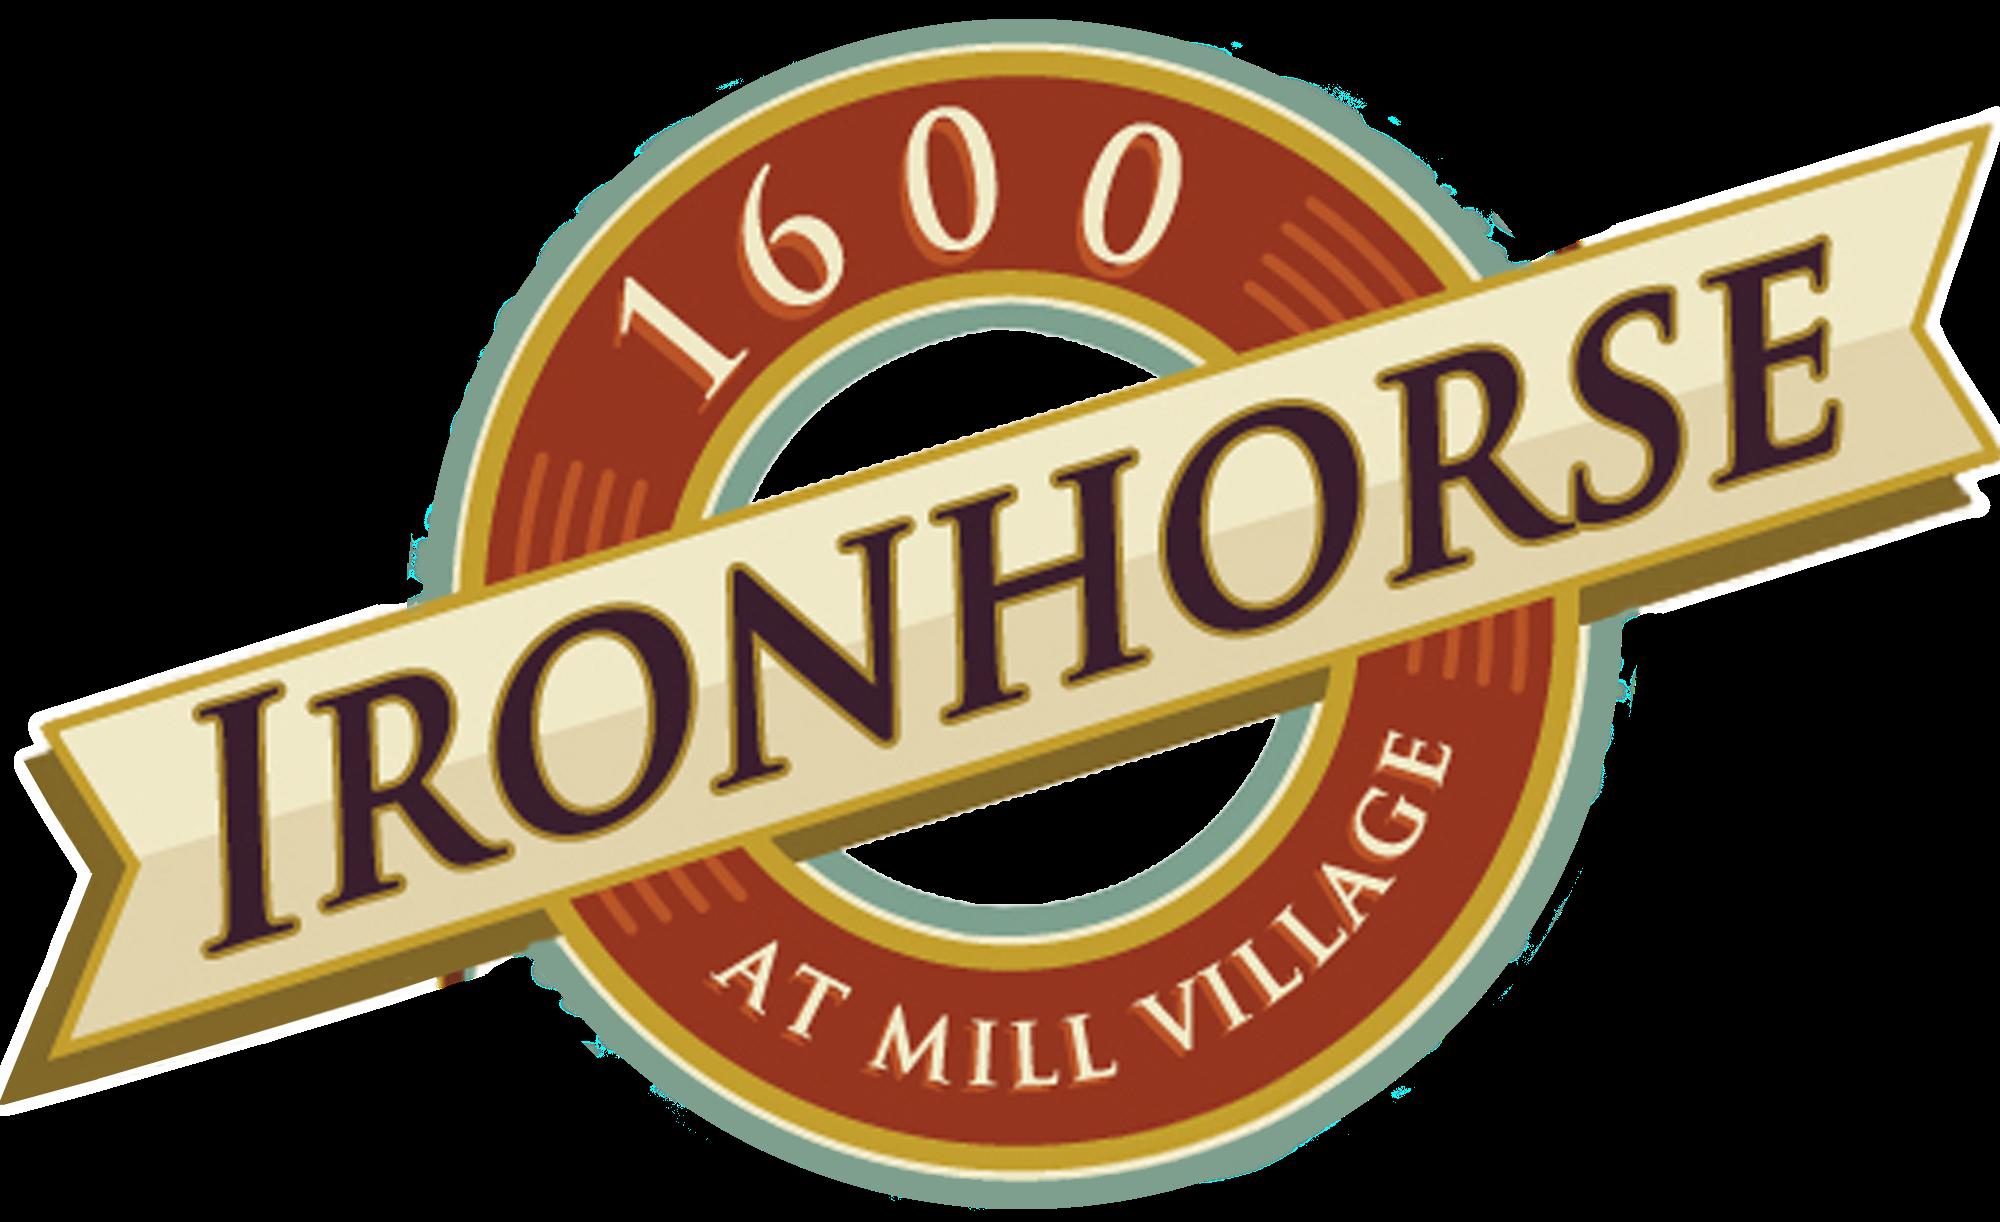 Logo for Ironhorse Apartments in Longmont